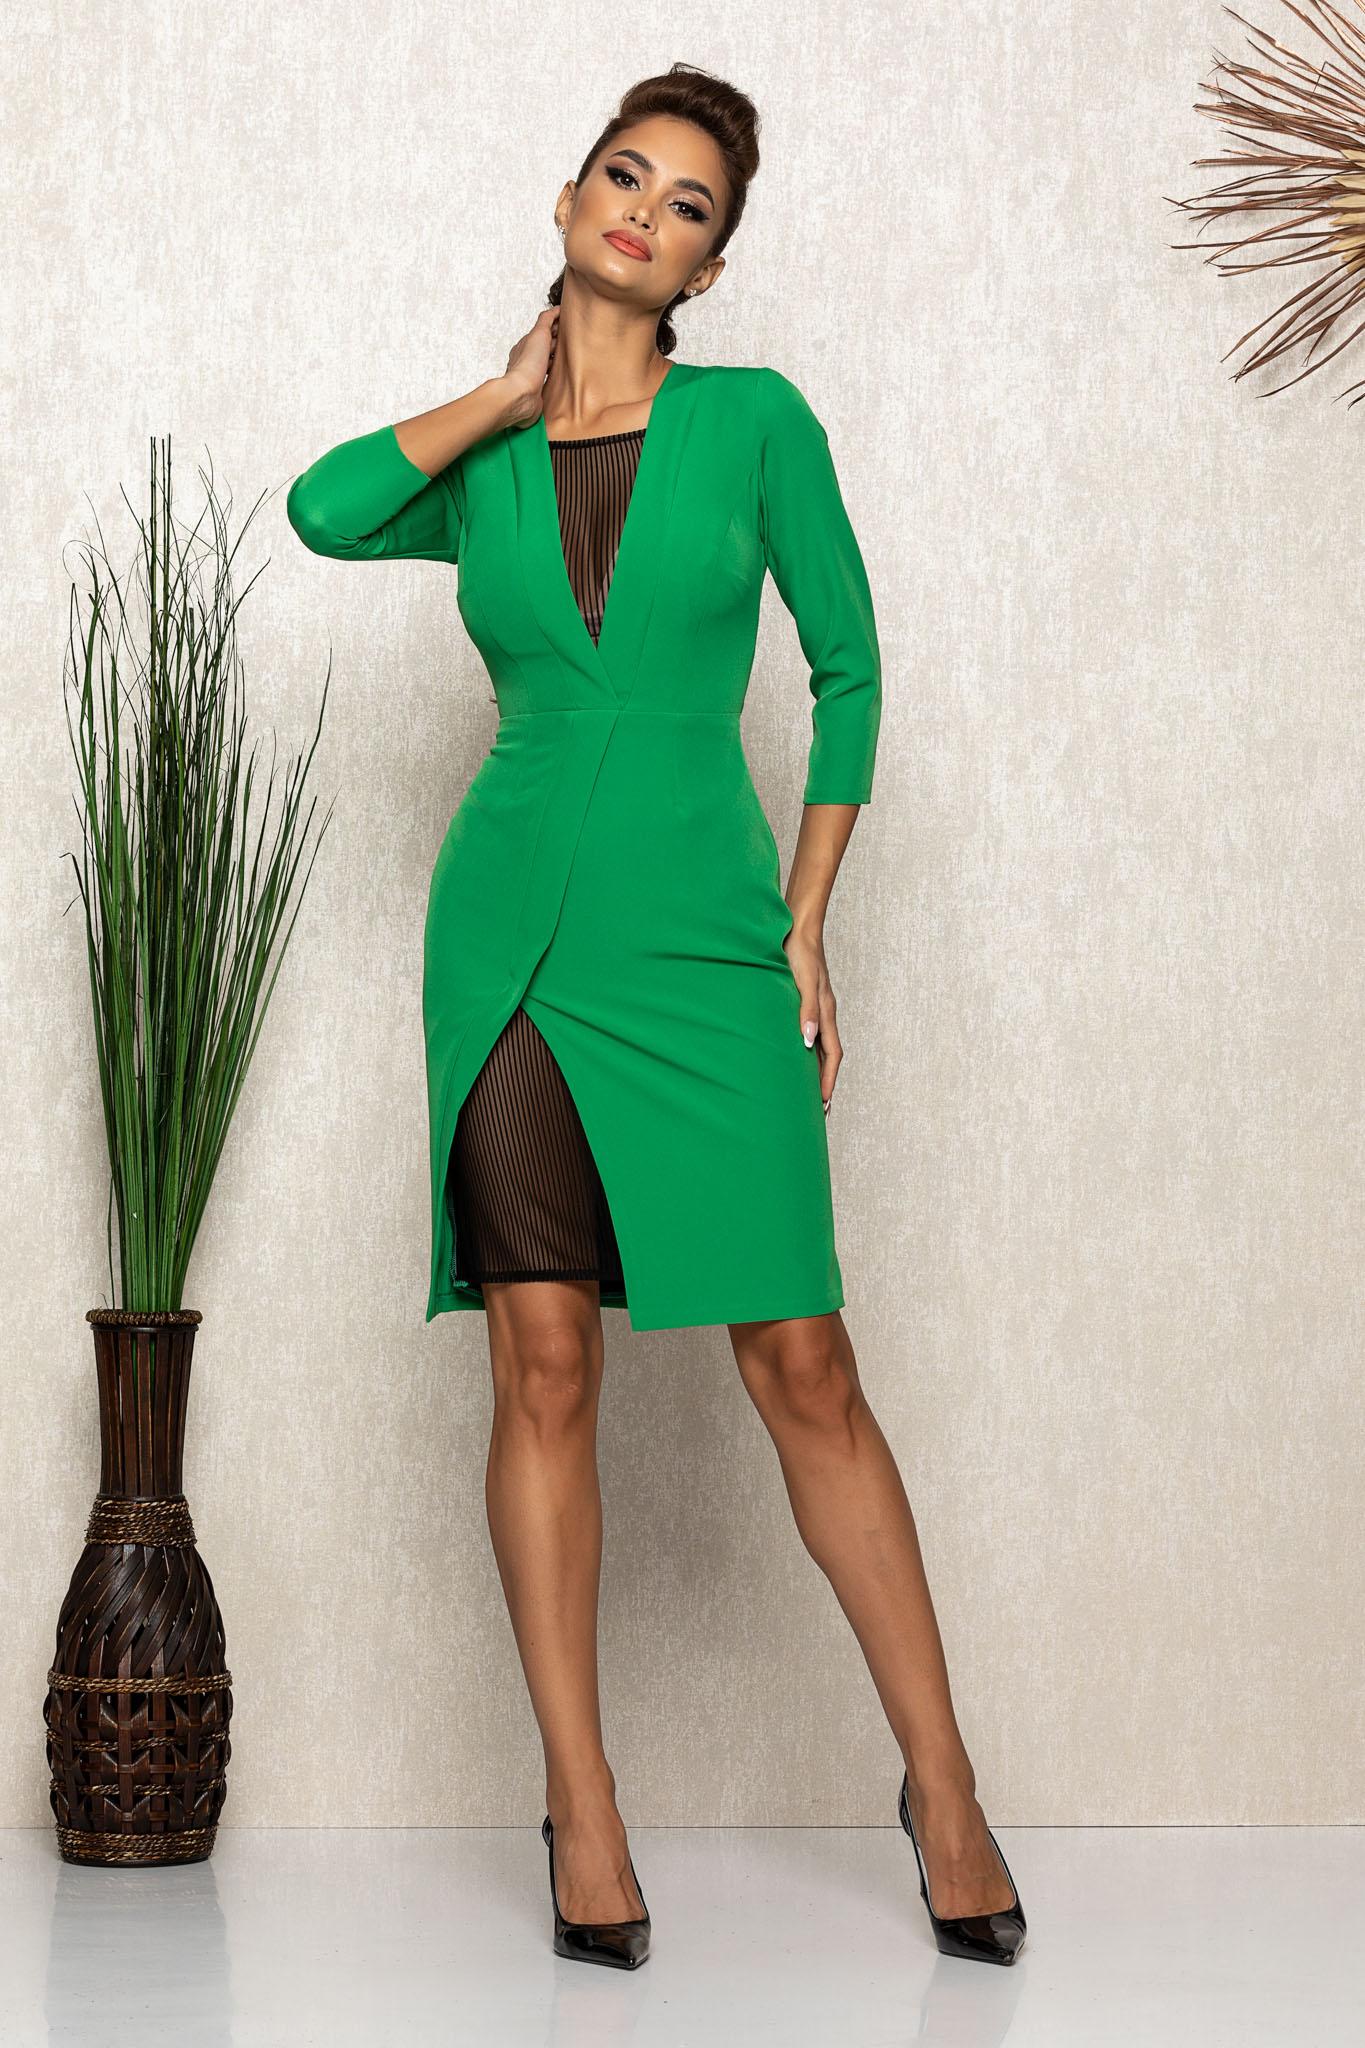 Rochie Moze Elise Verde Marimi Mari S (36)   M (38)   L (40)   XL (42)   XXL (44)   3XL (46)